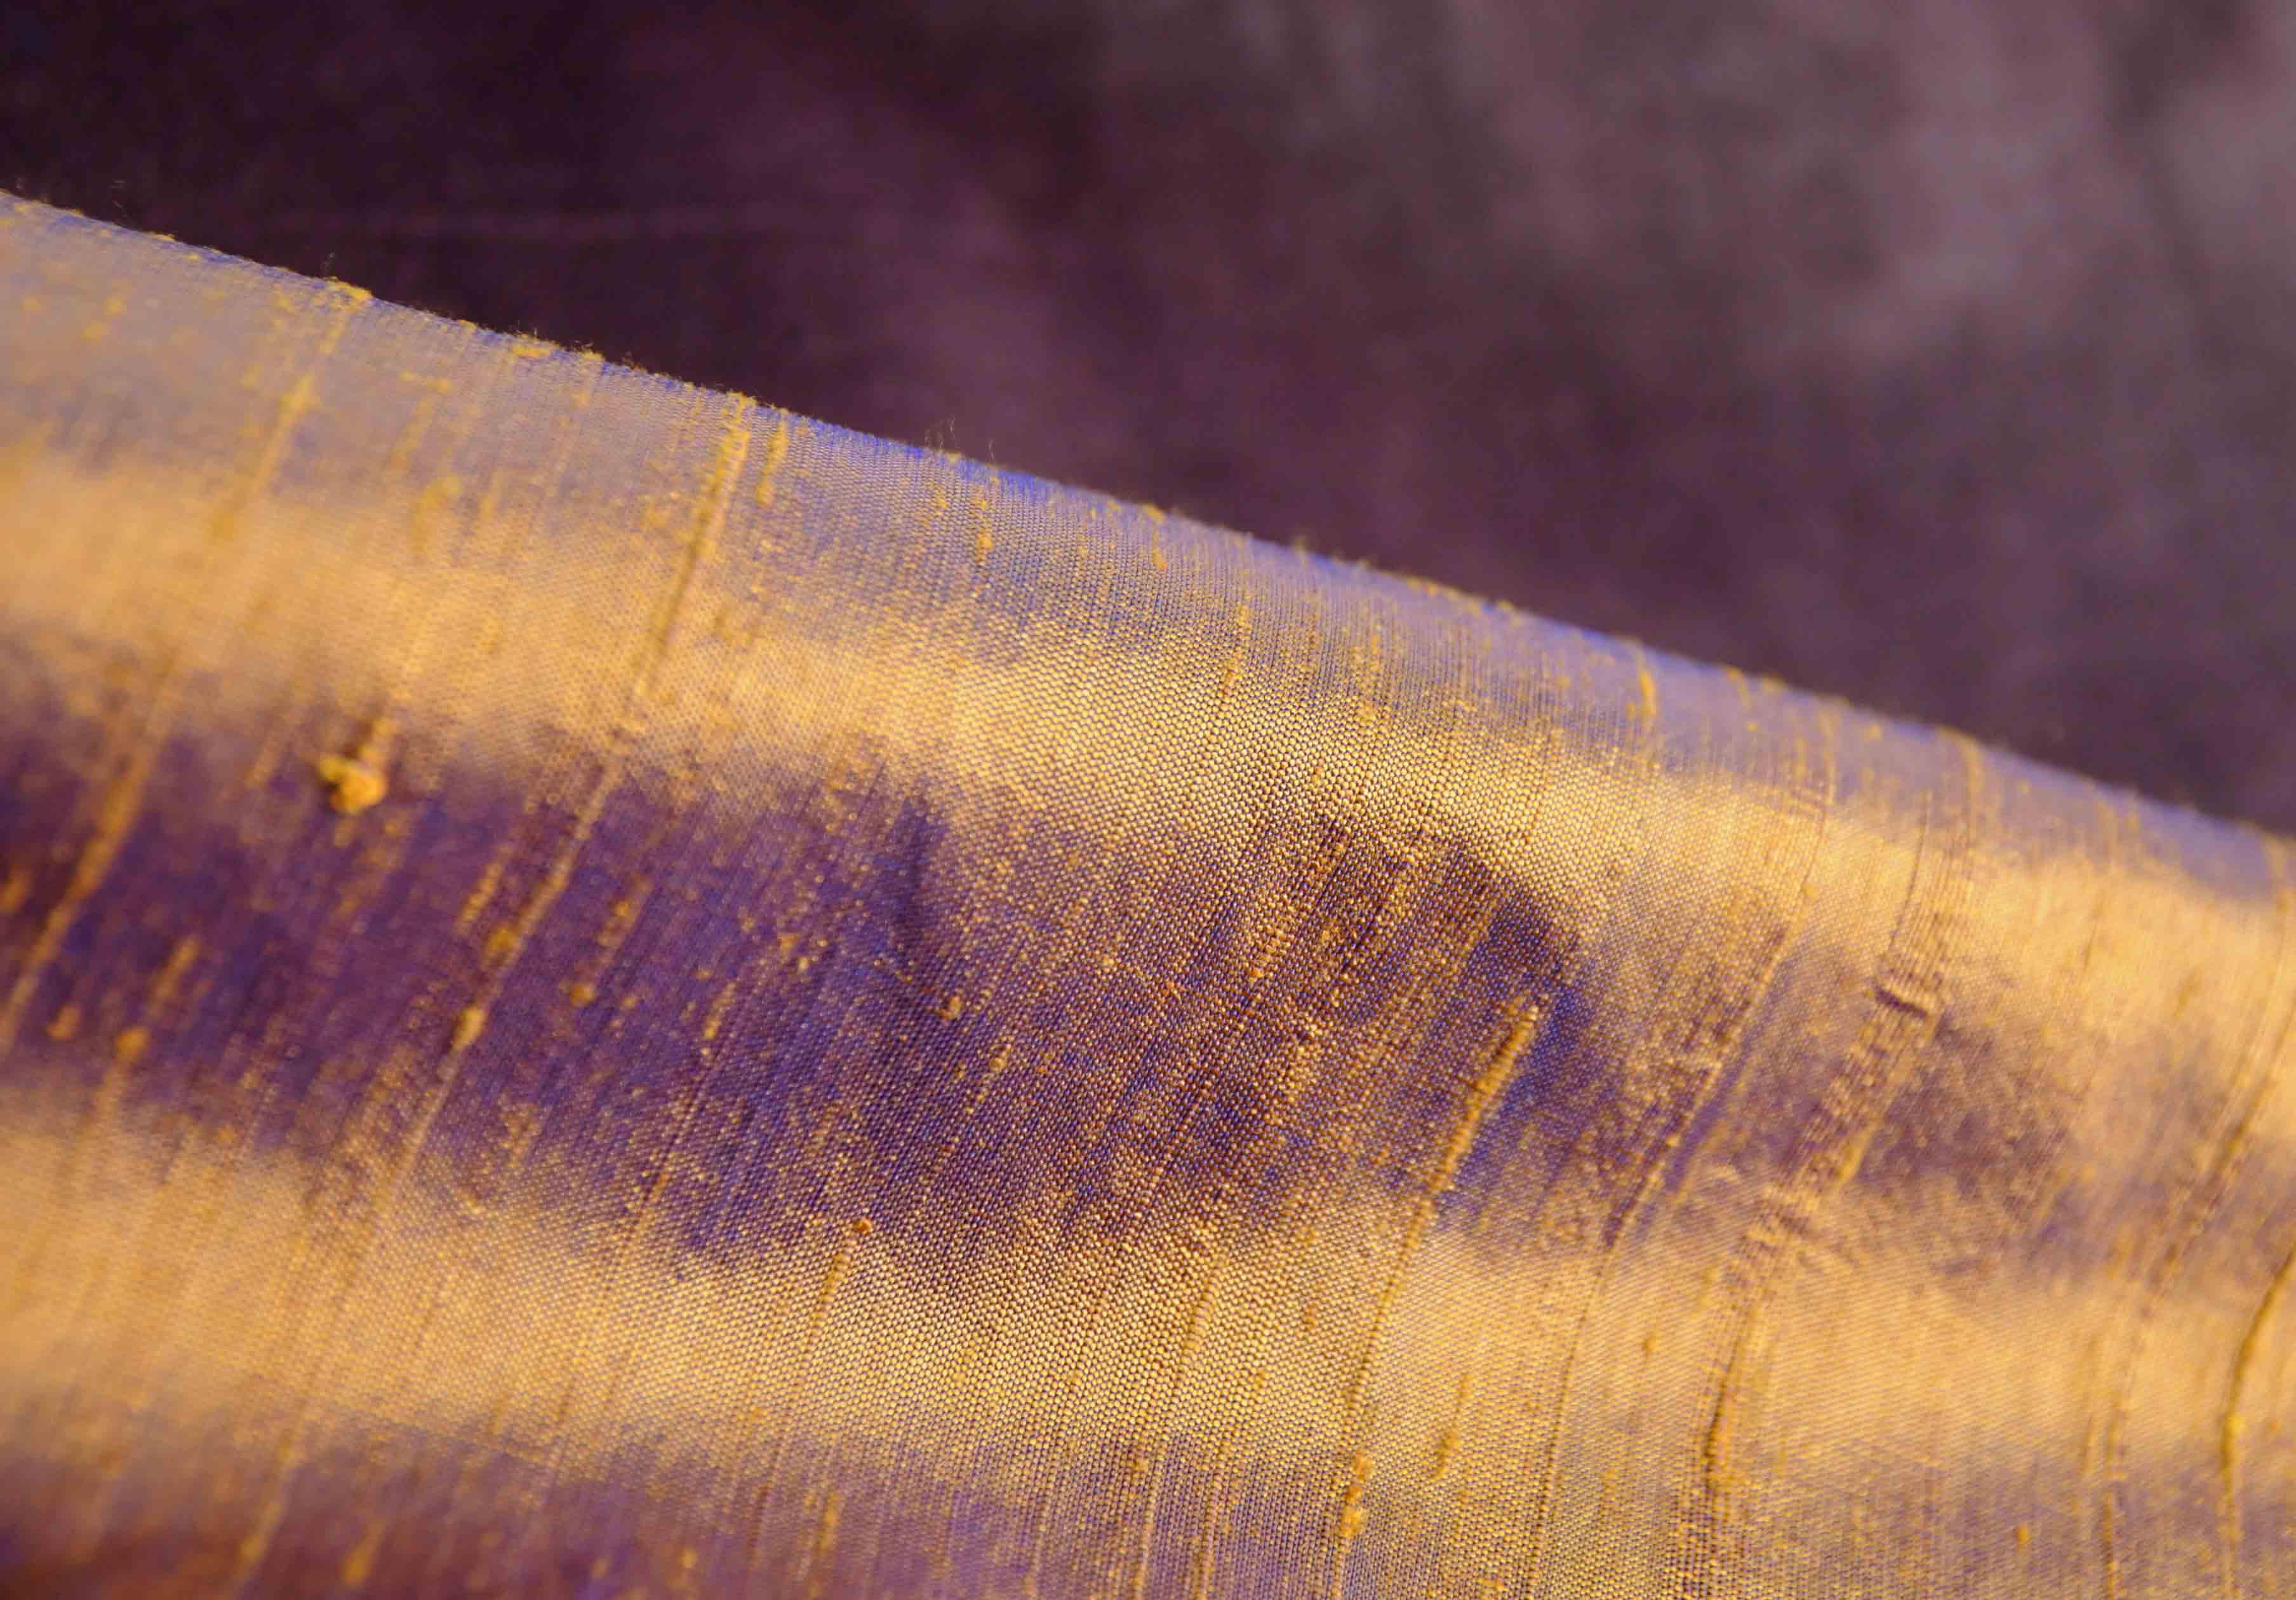 e3fdaa69e82cd Luxury 100% Silk Dupion Fabric - Fabric Blog